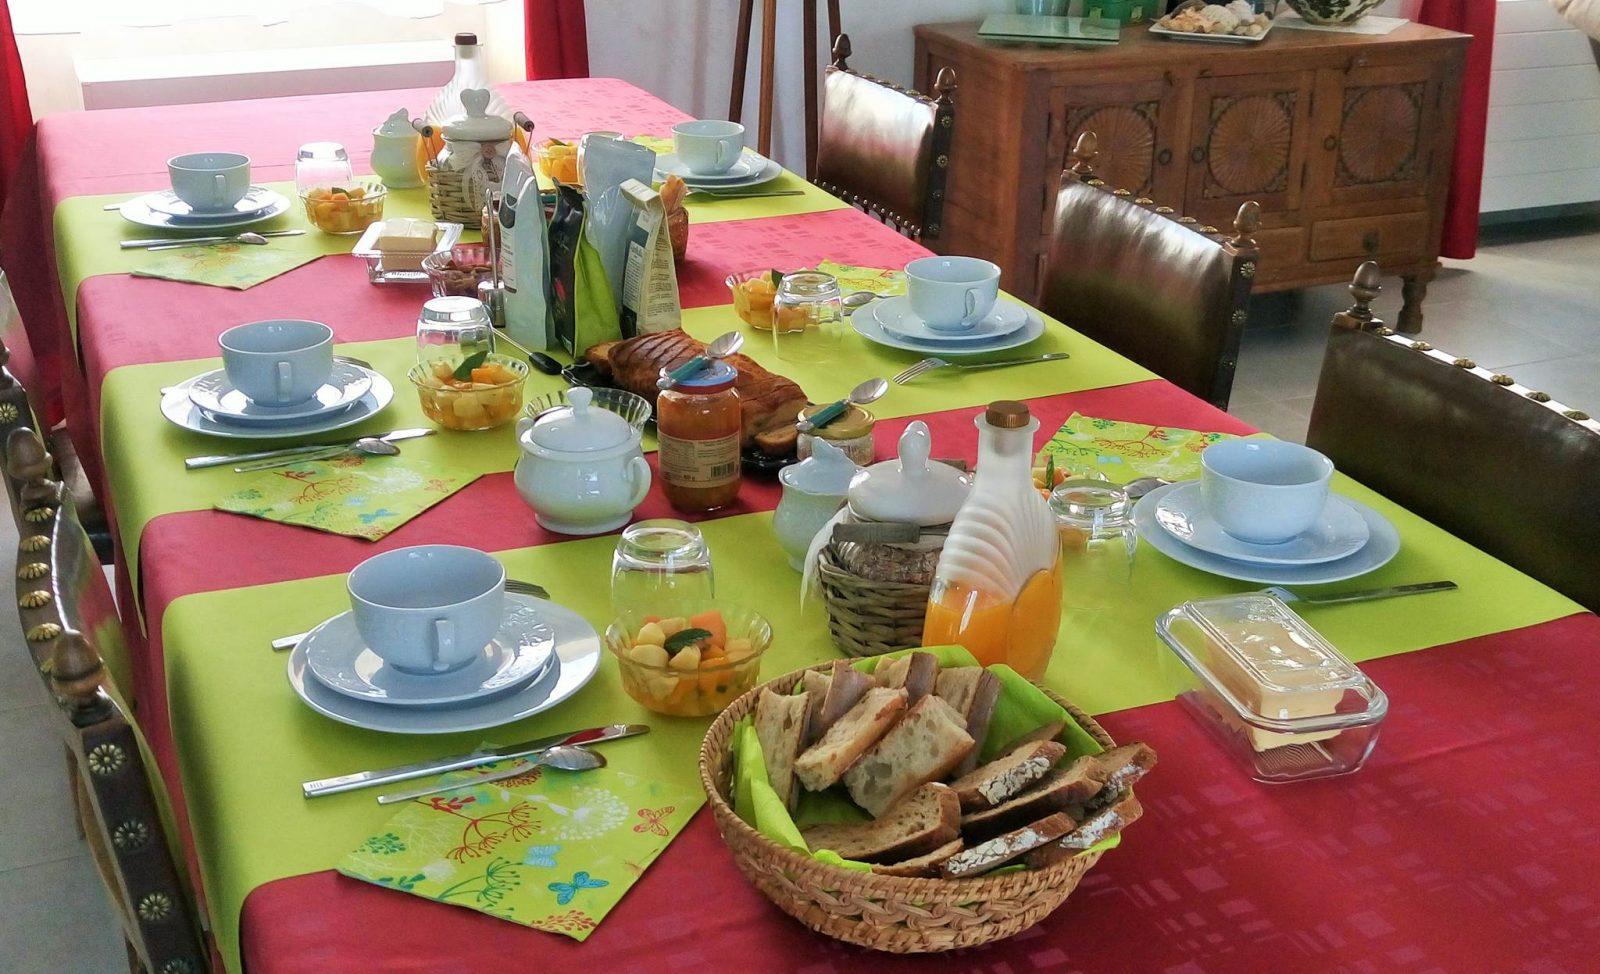 chambre d'hote-Takacs-petit-déjeuner-St Dolay-Tourisme Arc Sud Bretagne